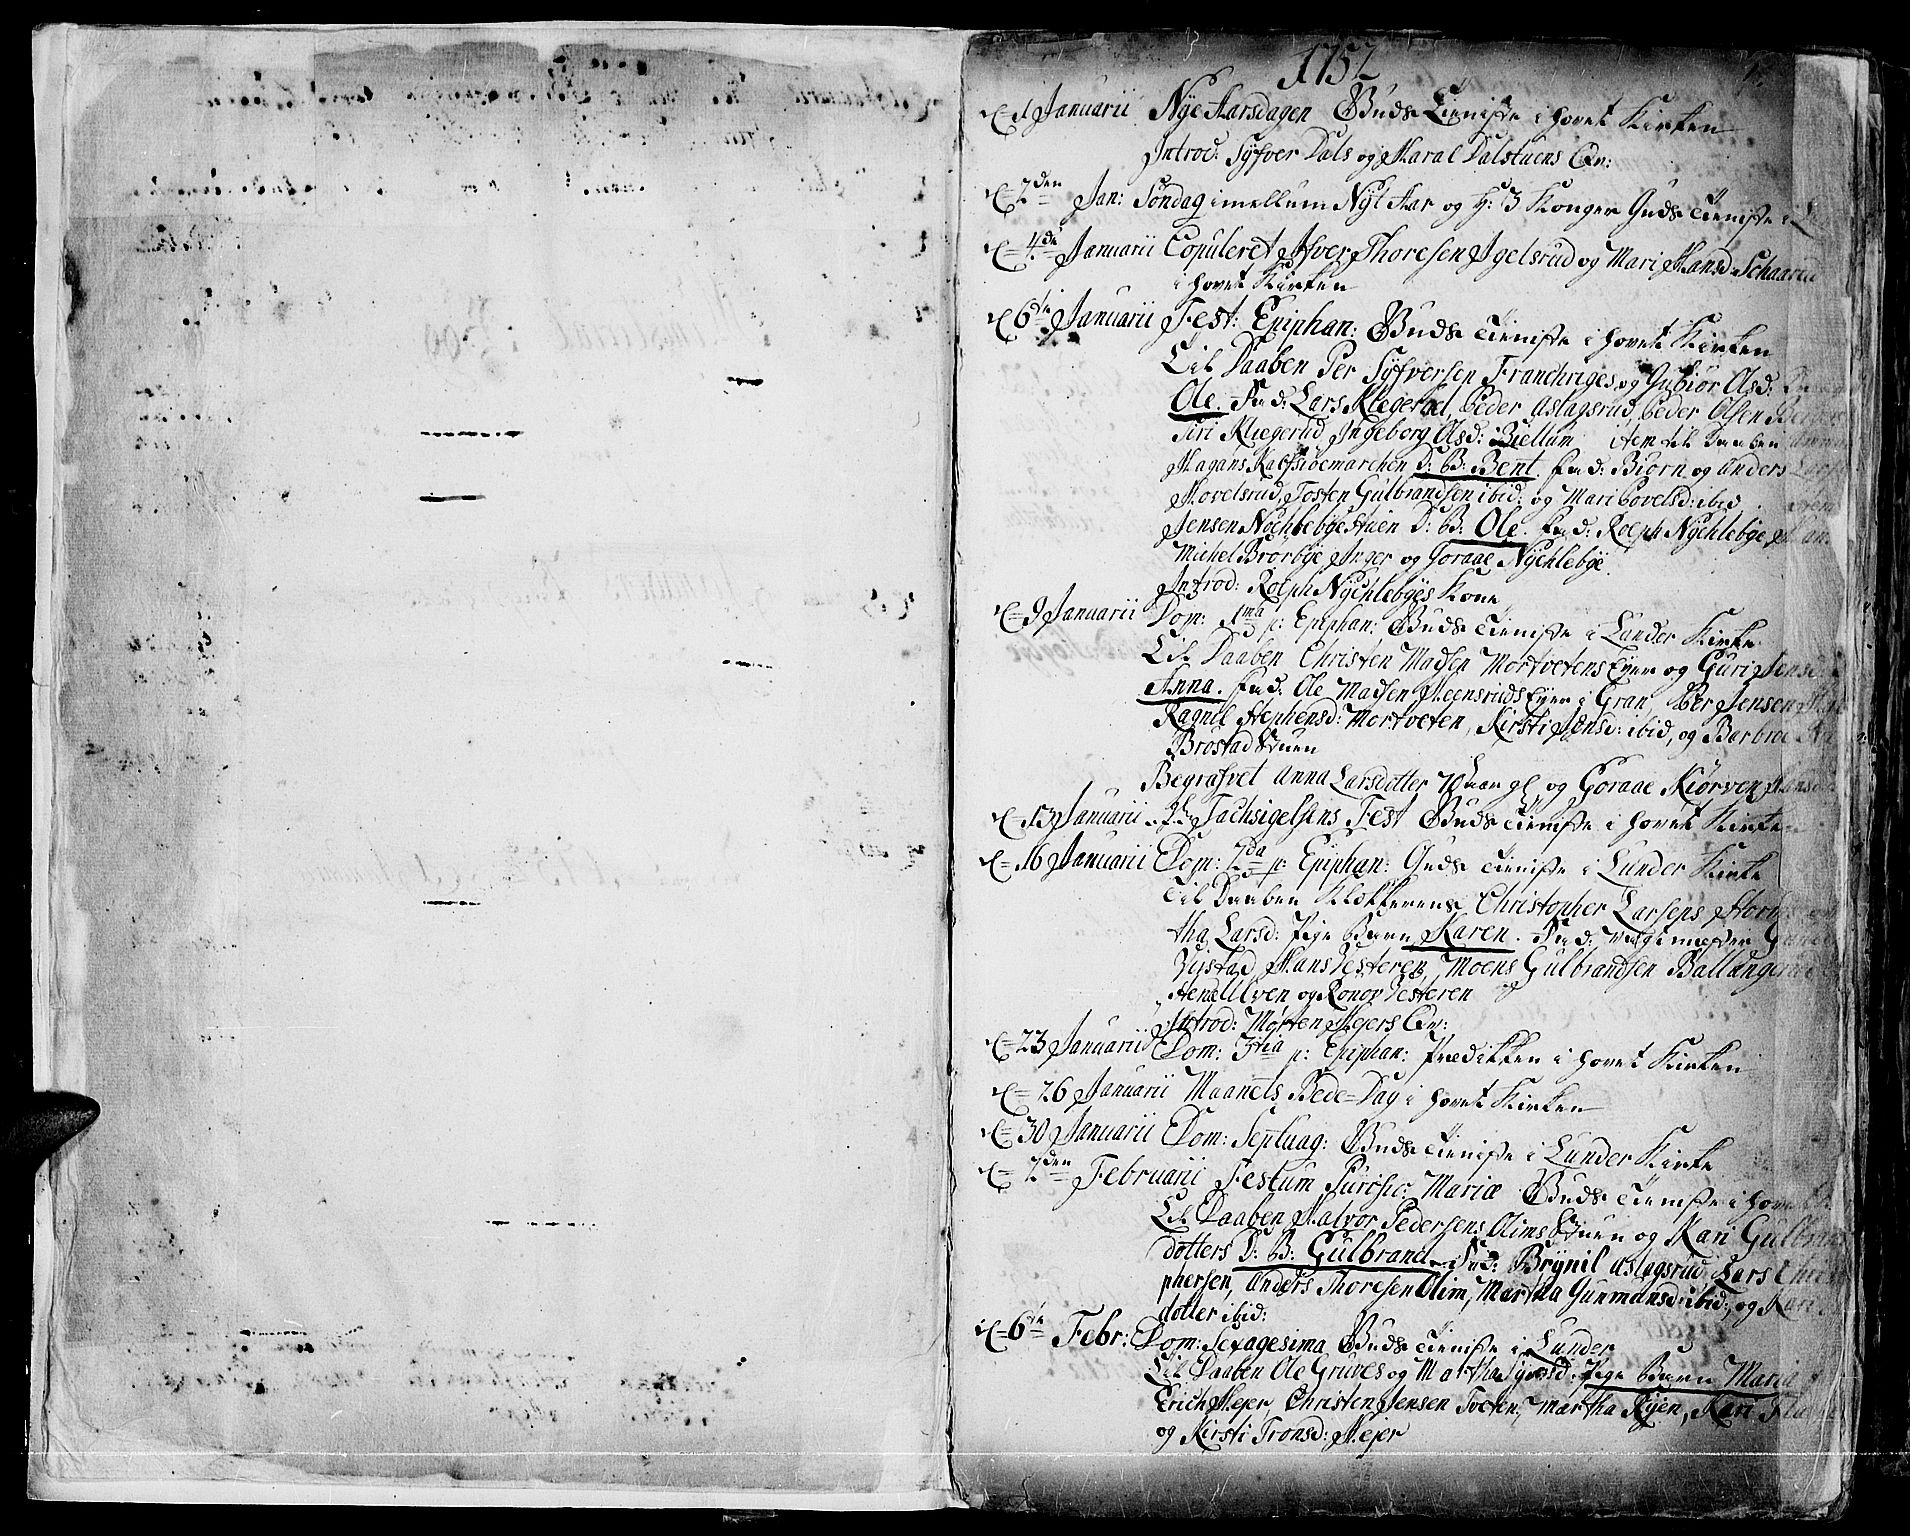 SAH, Jevnaker prestekontor, Ministerialbok nr. 3, 1752-1799, s. 0-1